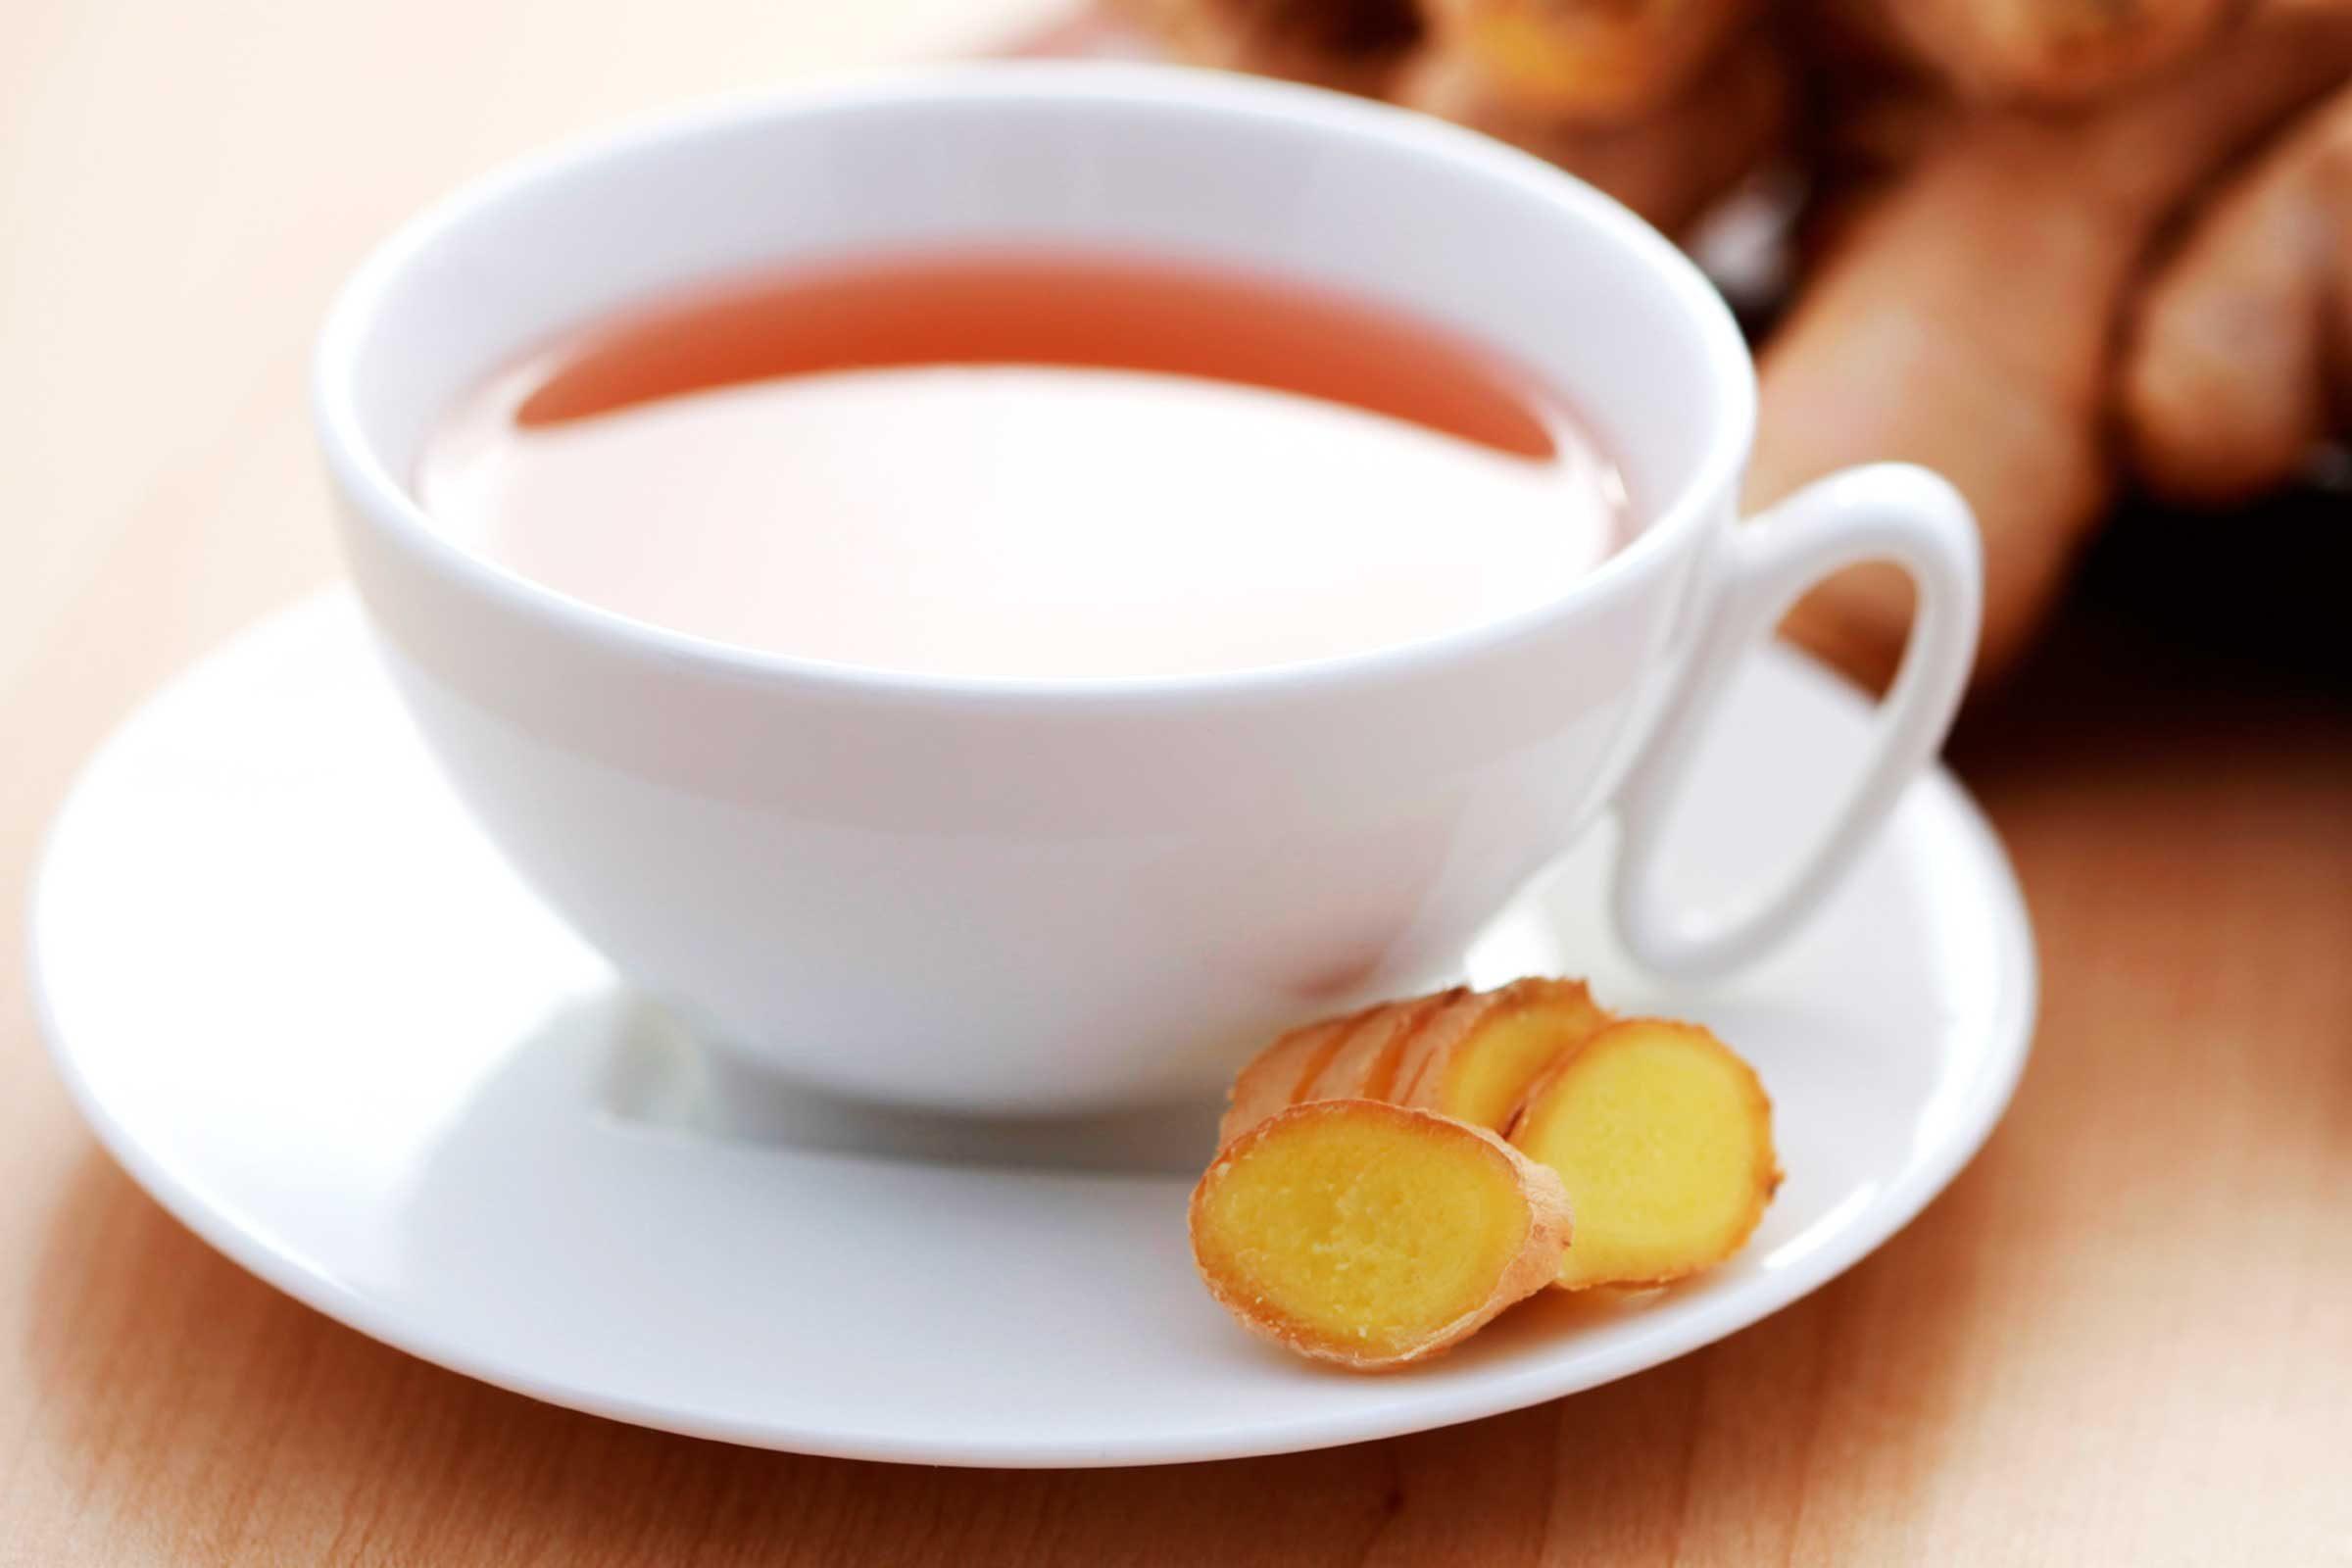 meilleur-repas-malade-crampe-menstruelle-gingembre